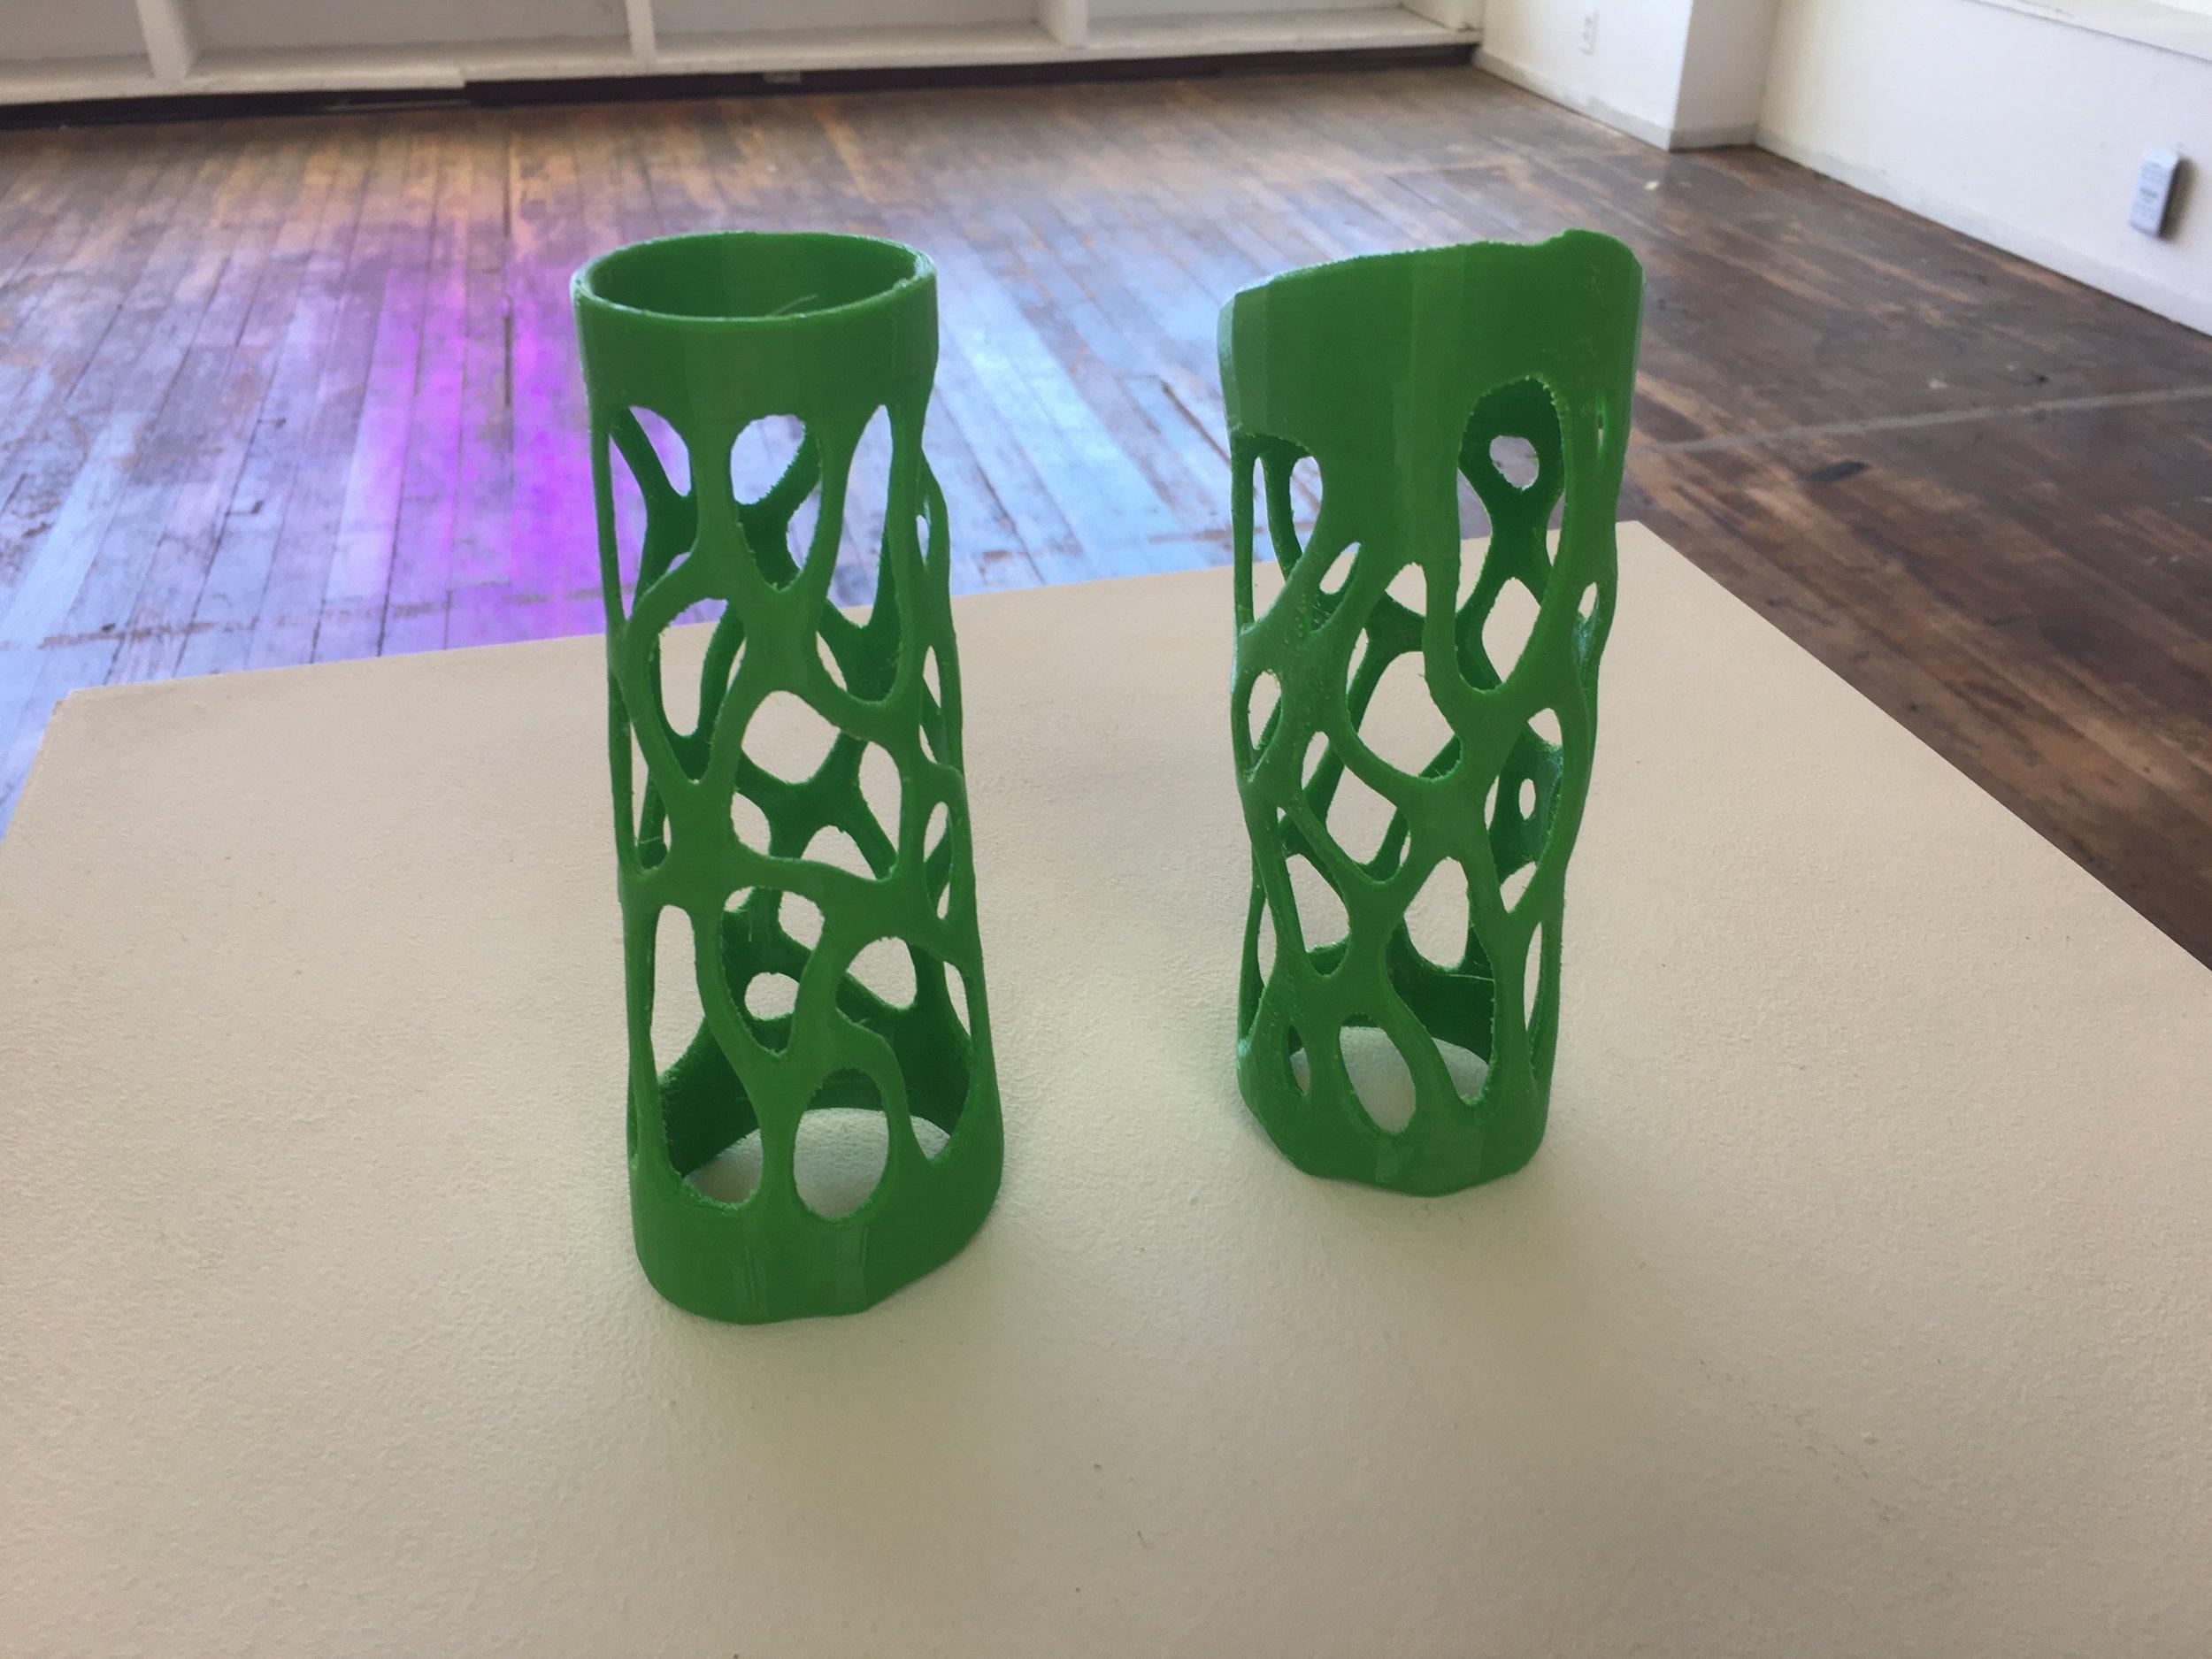 3D Printed arm pieces, Tiare Ribeaux, 2018